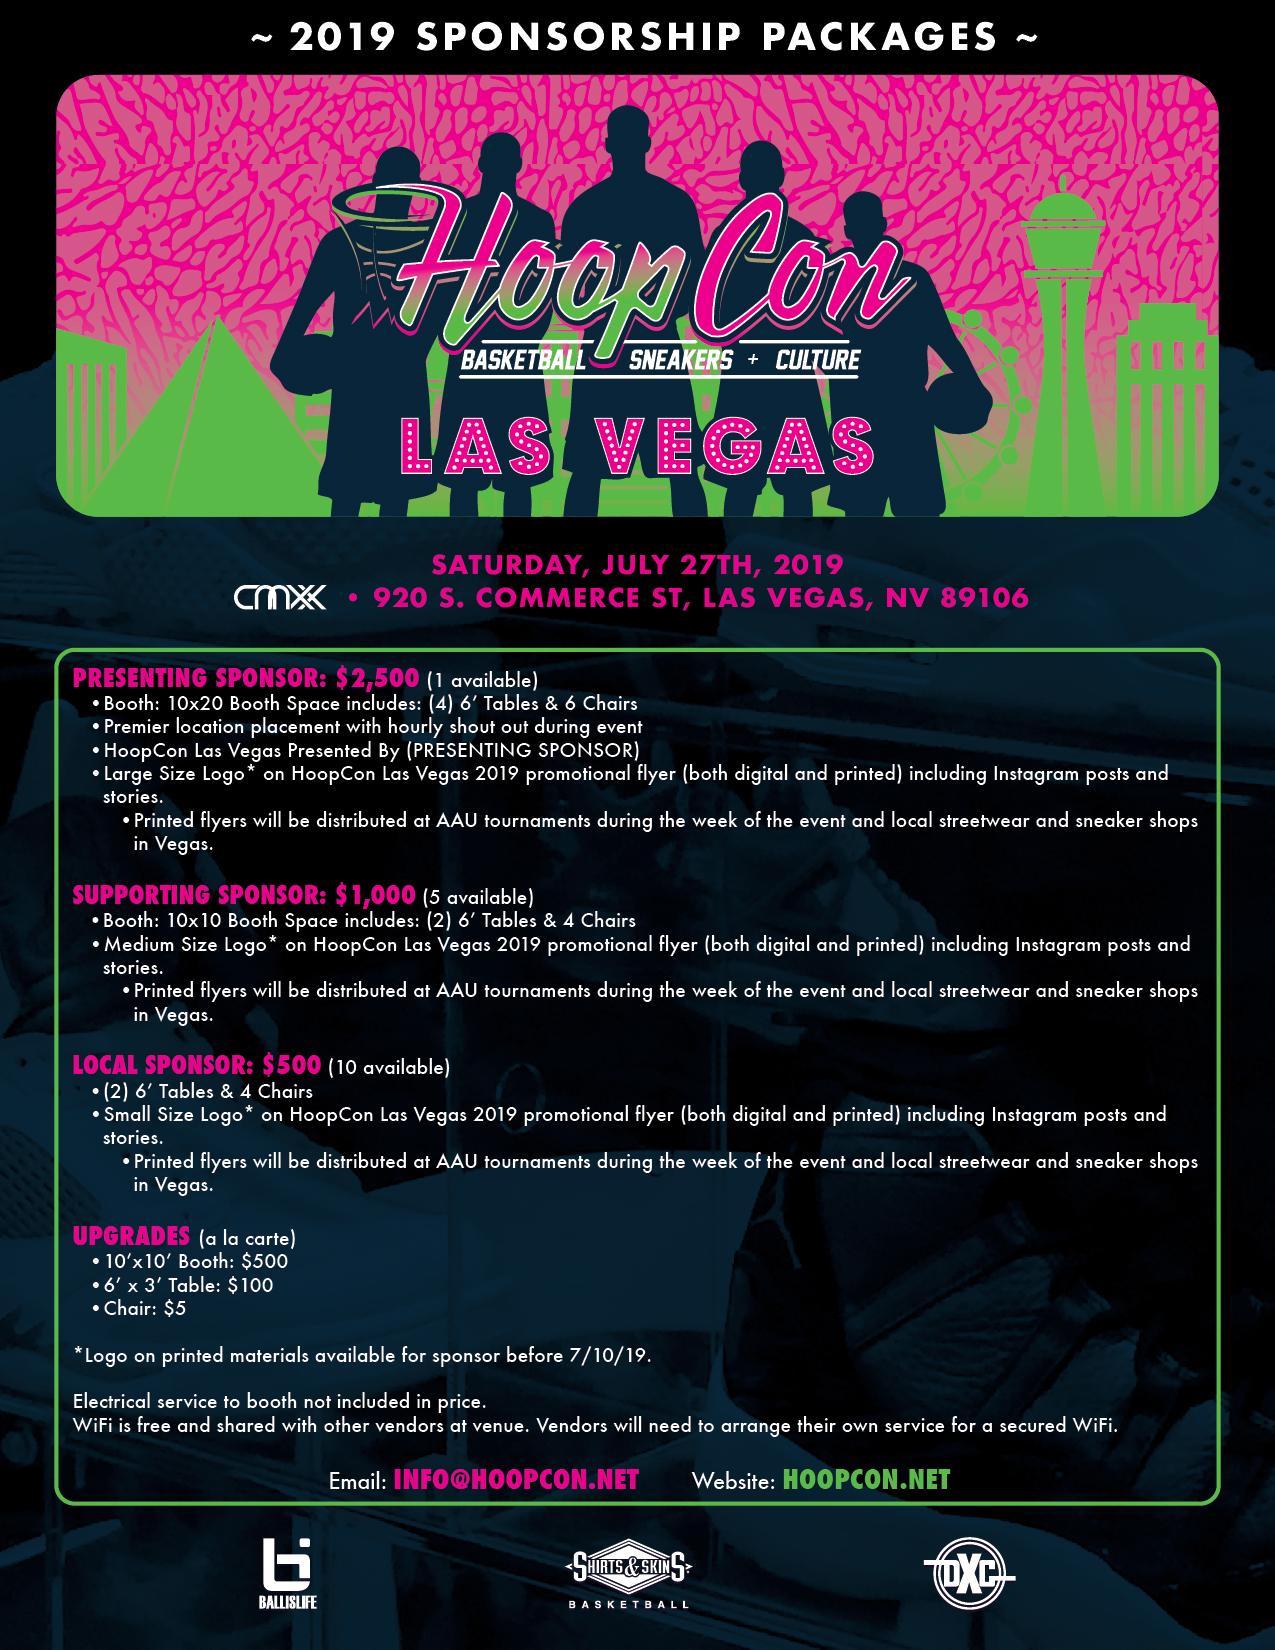 Hoopcon_2019 Sponsorship Flyer_Las Vegas.jpg